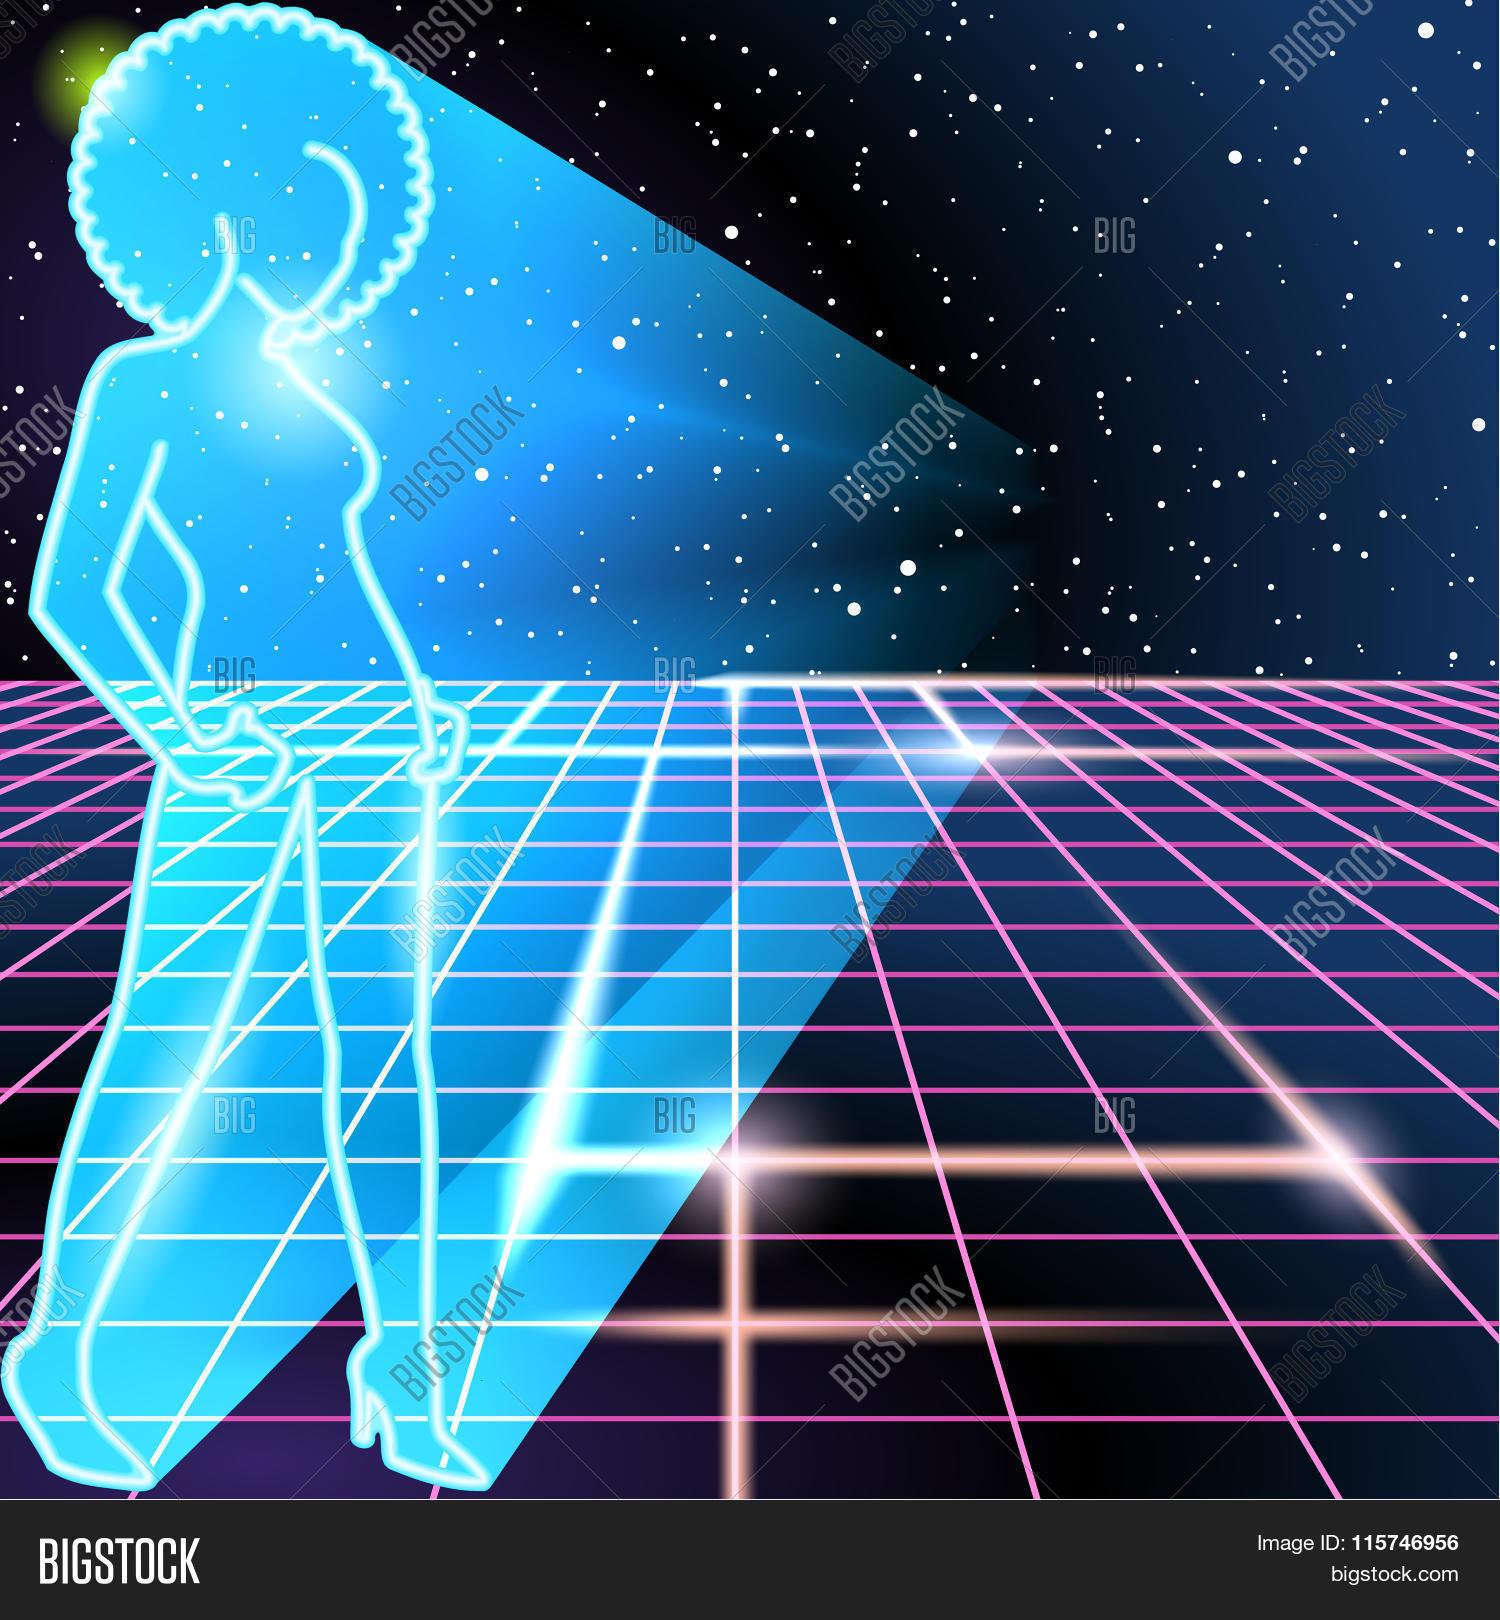 80s Background Neon Vector & Photo (Free Trial) | Bigstock